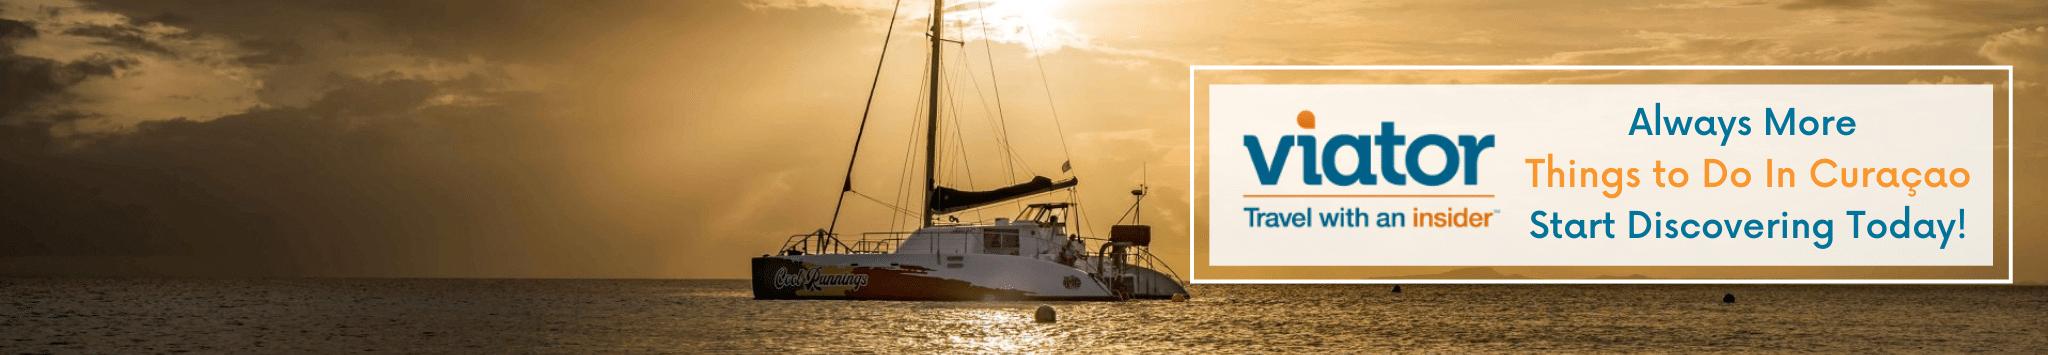 Klein Curaçao Day Trips | Explore Curacao | Dive Travel Curacao